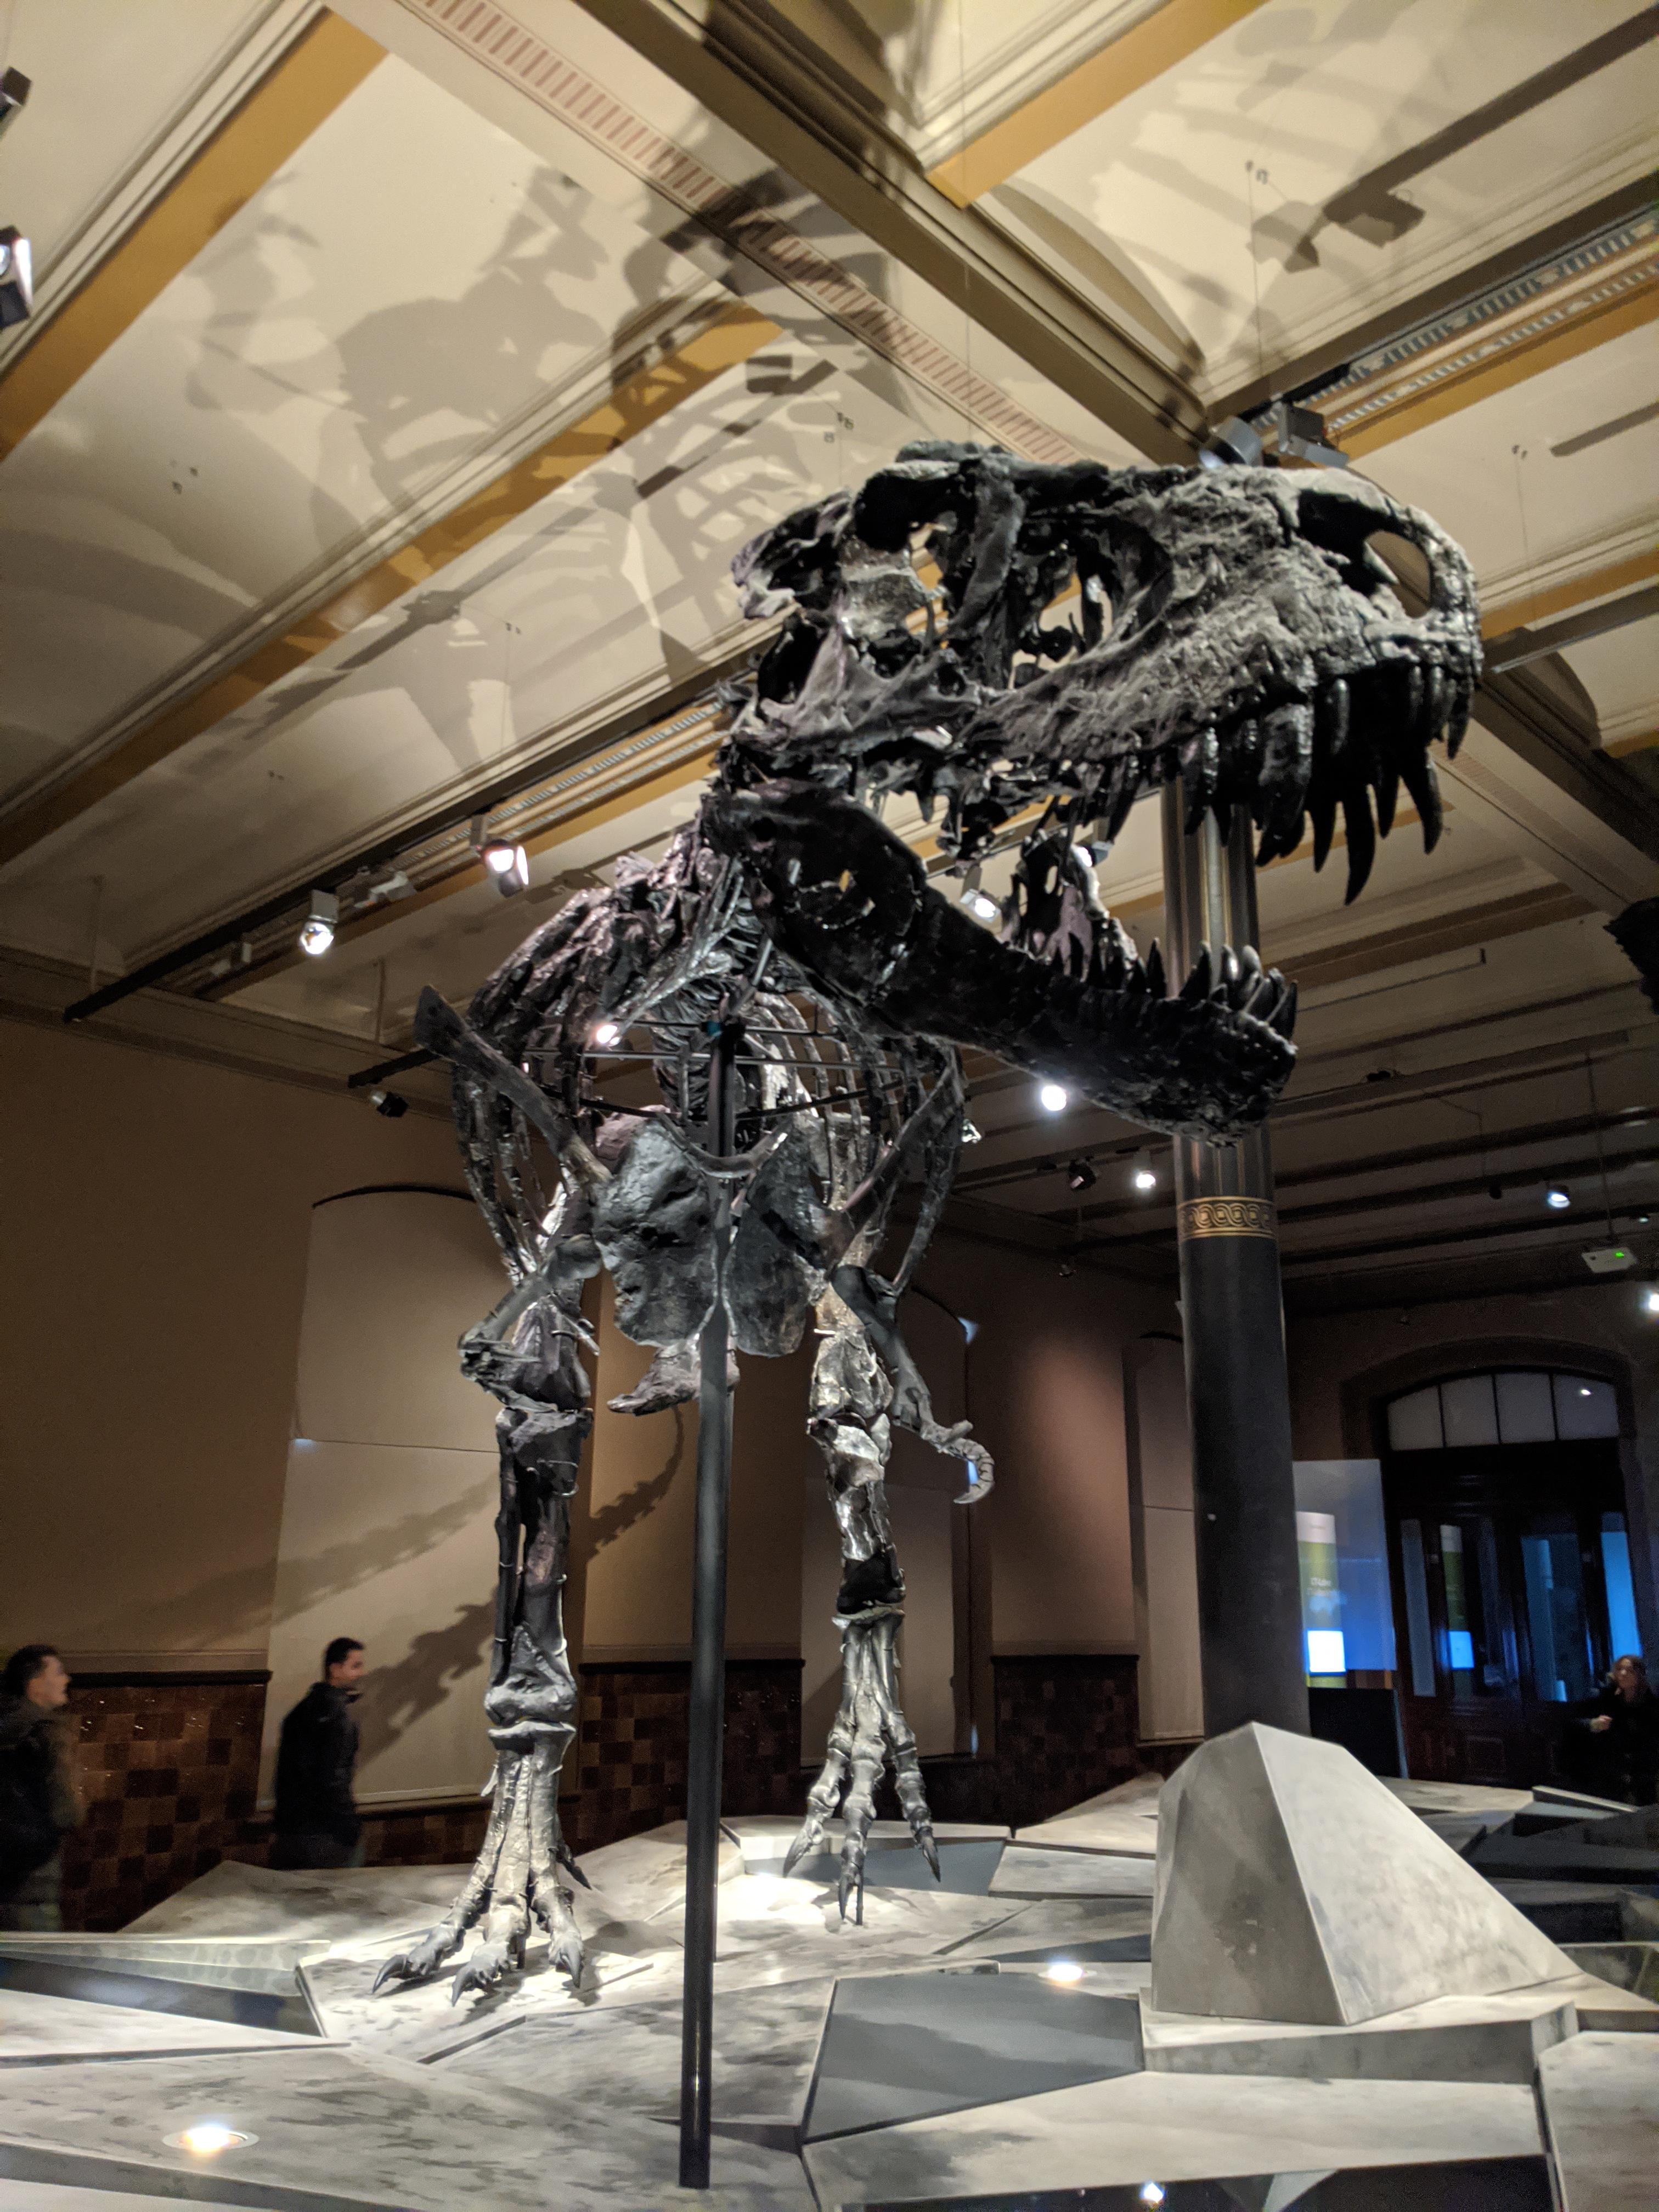 Tristan Otto The Black T Rex In The Naturkunde Museum In